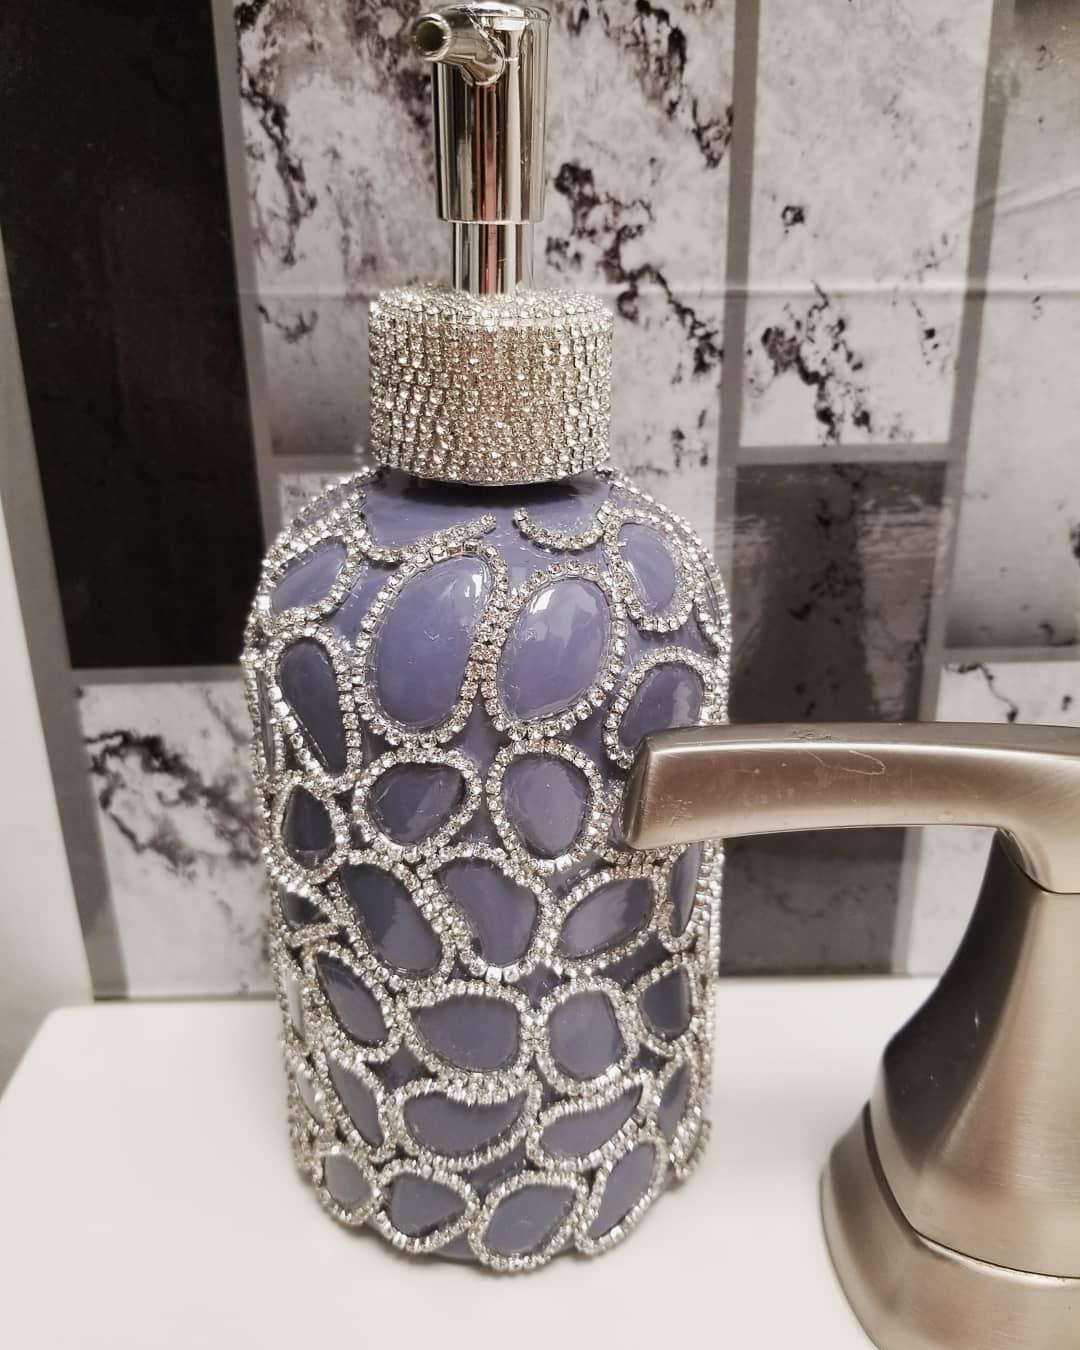 Bling for your bathroom Glam Decor Crystal Bling Soap Dispensers